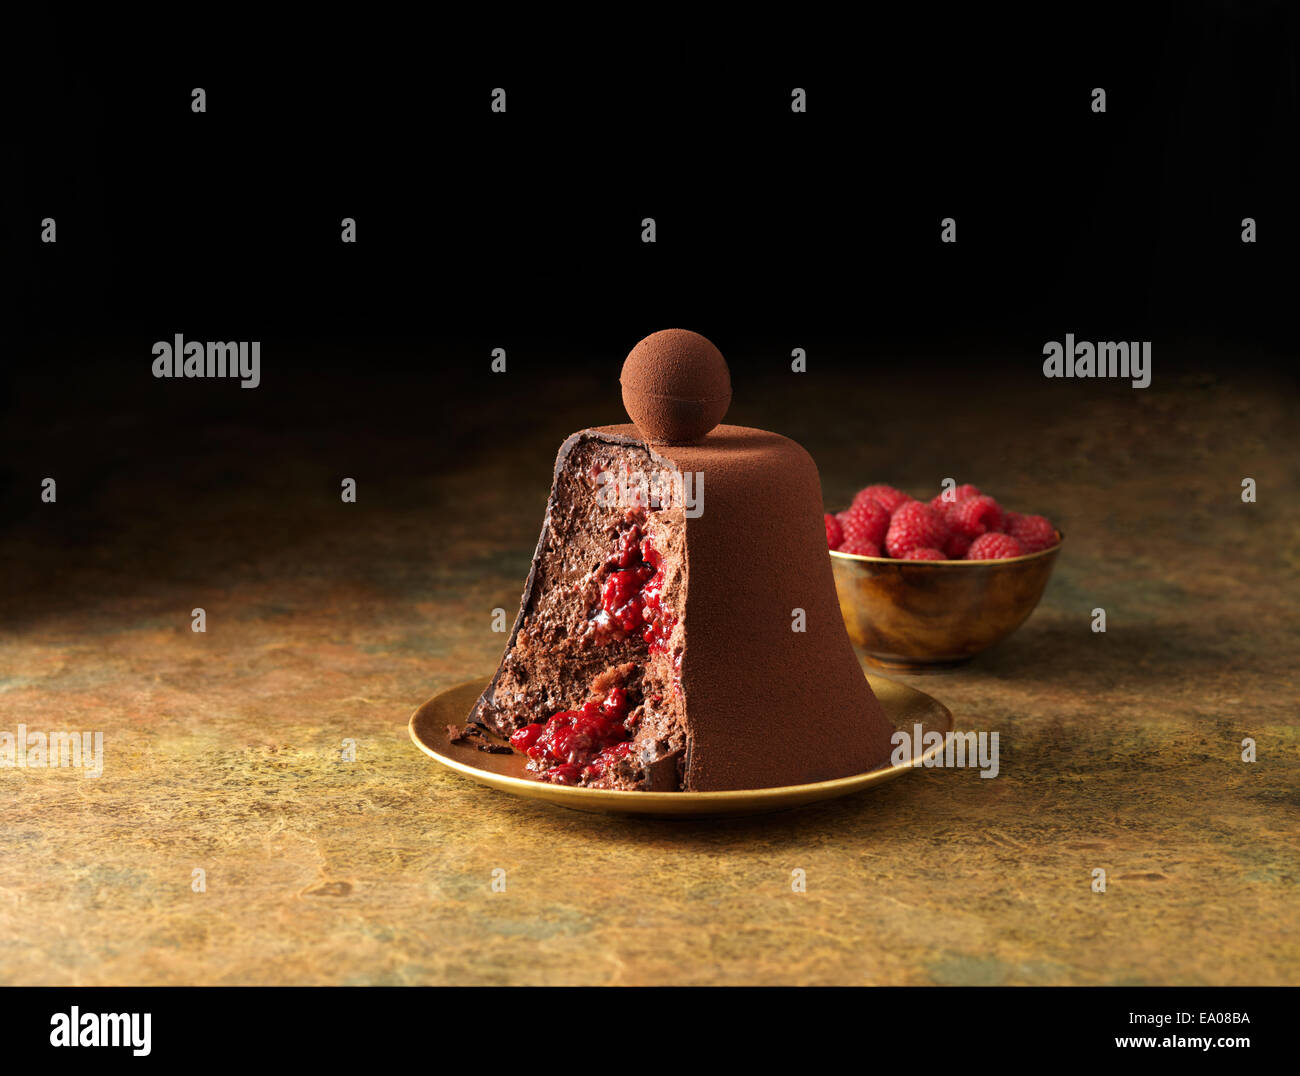 Dessert Mousse au chocolat Photo Stock